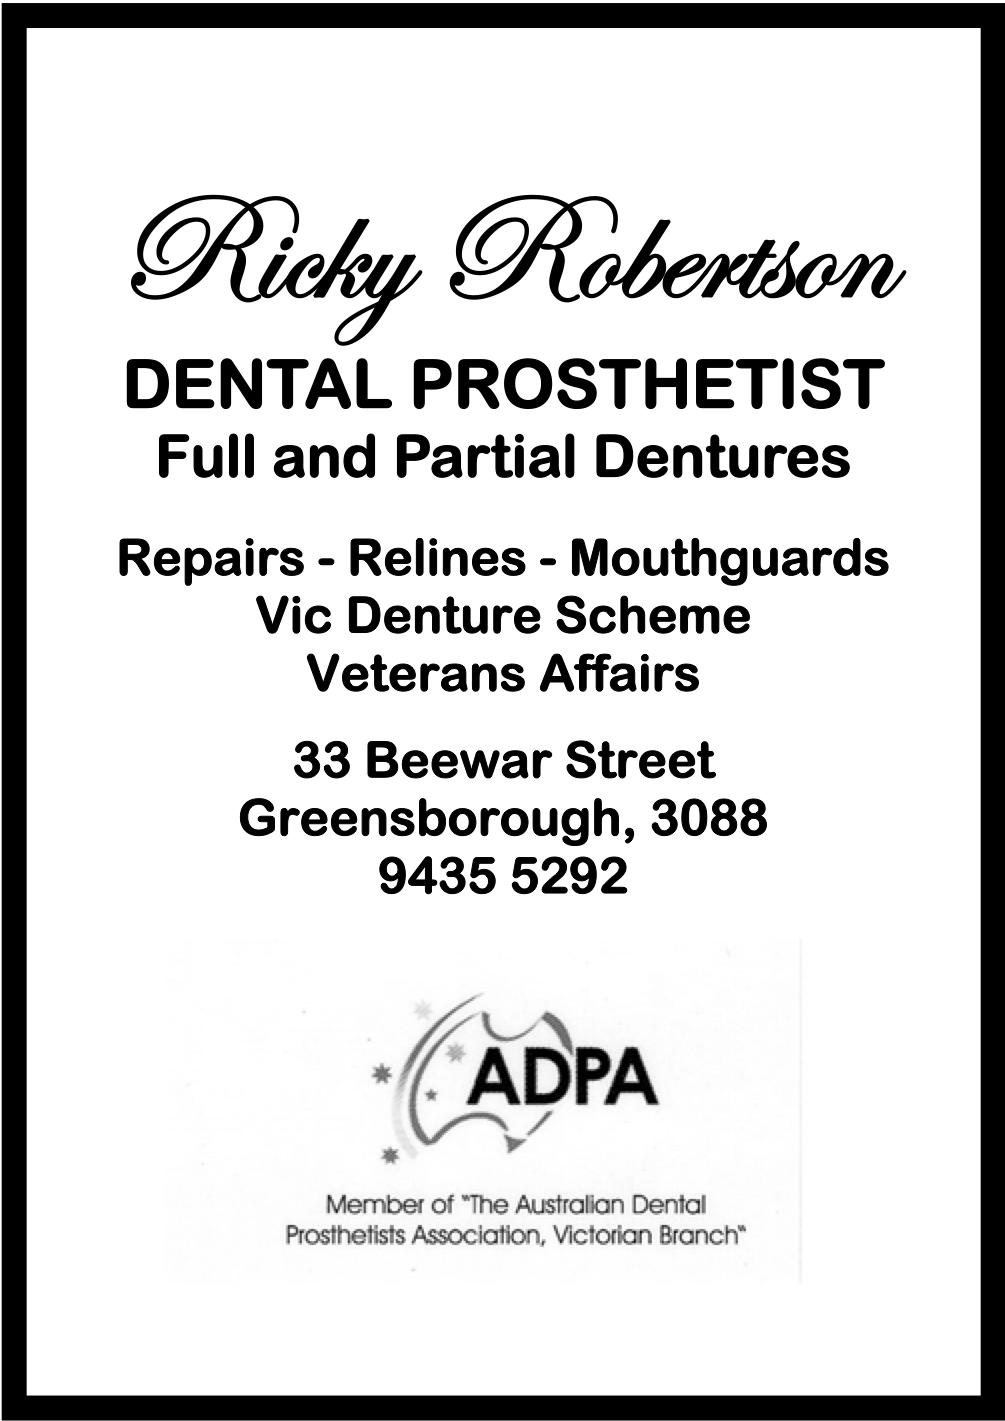 Ricky Robertson - Dental Prosthetist